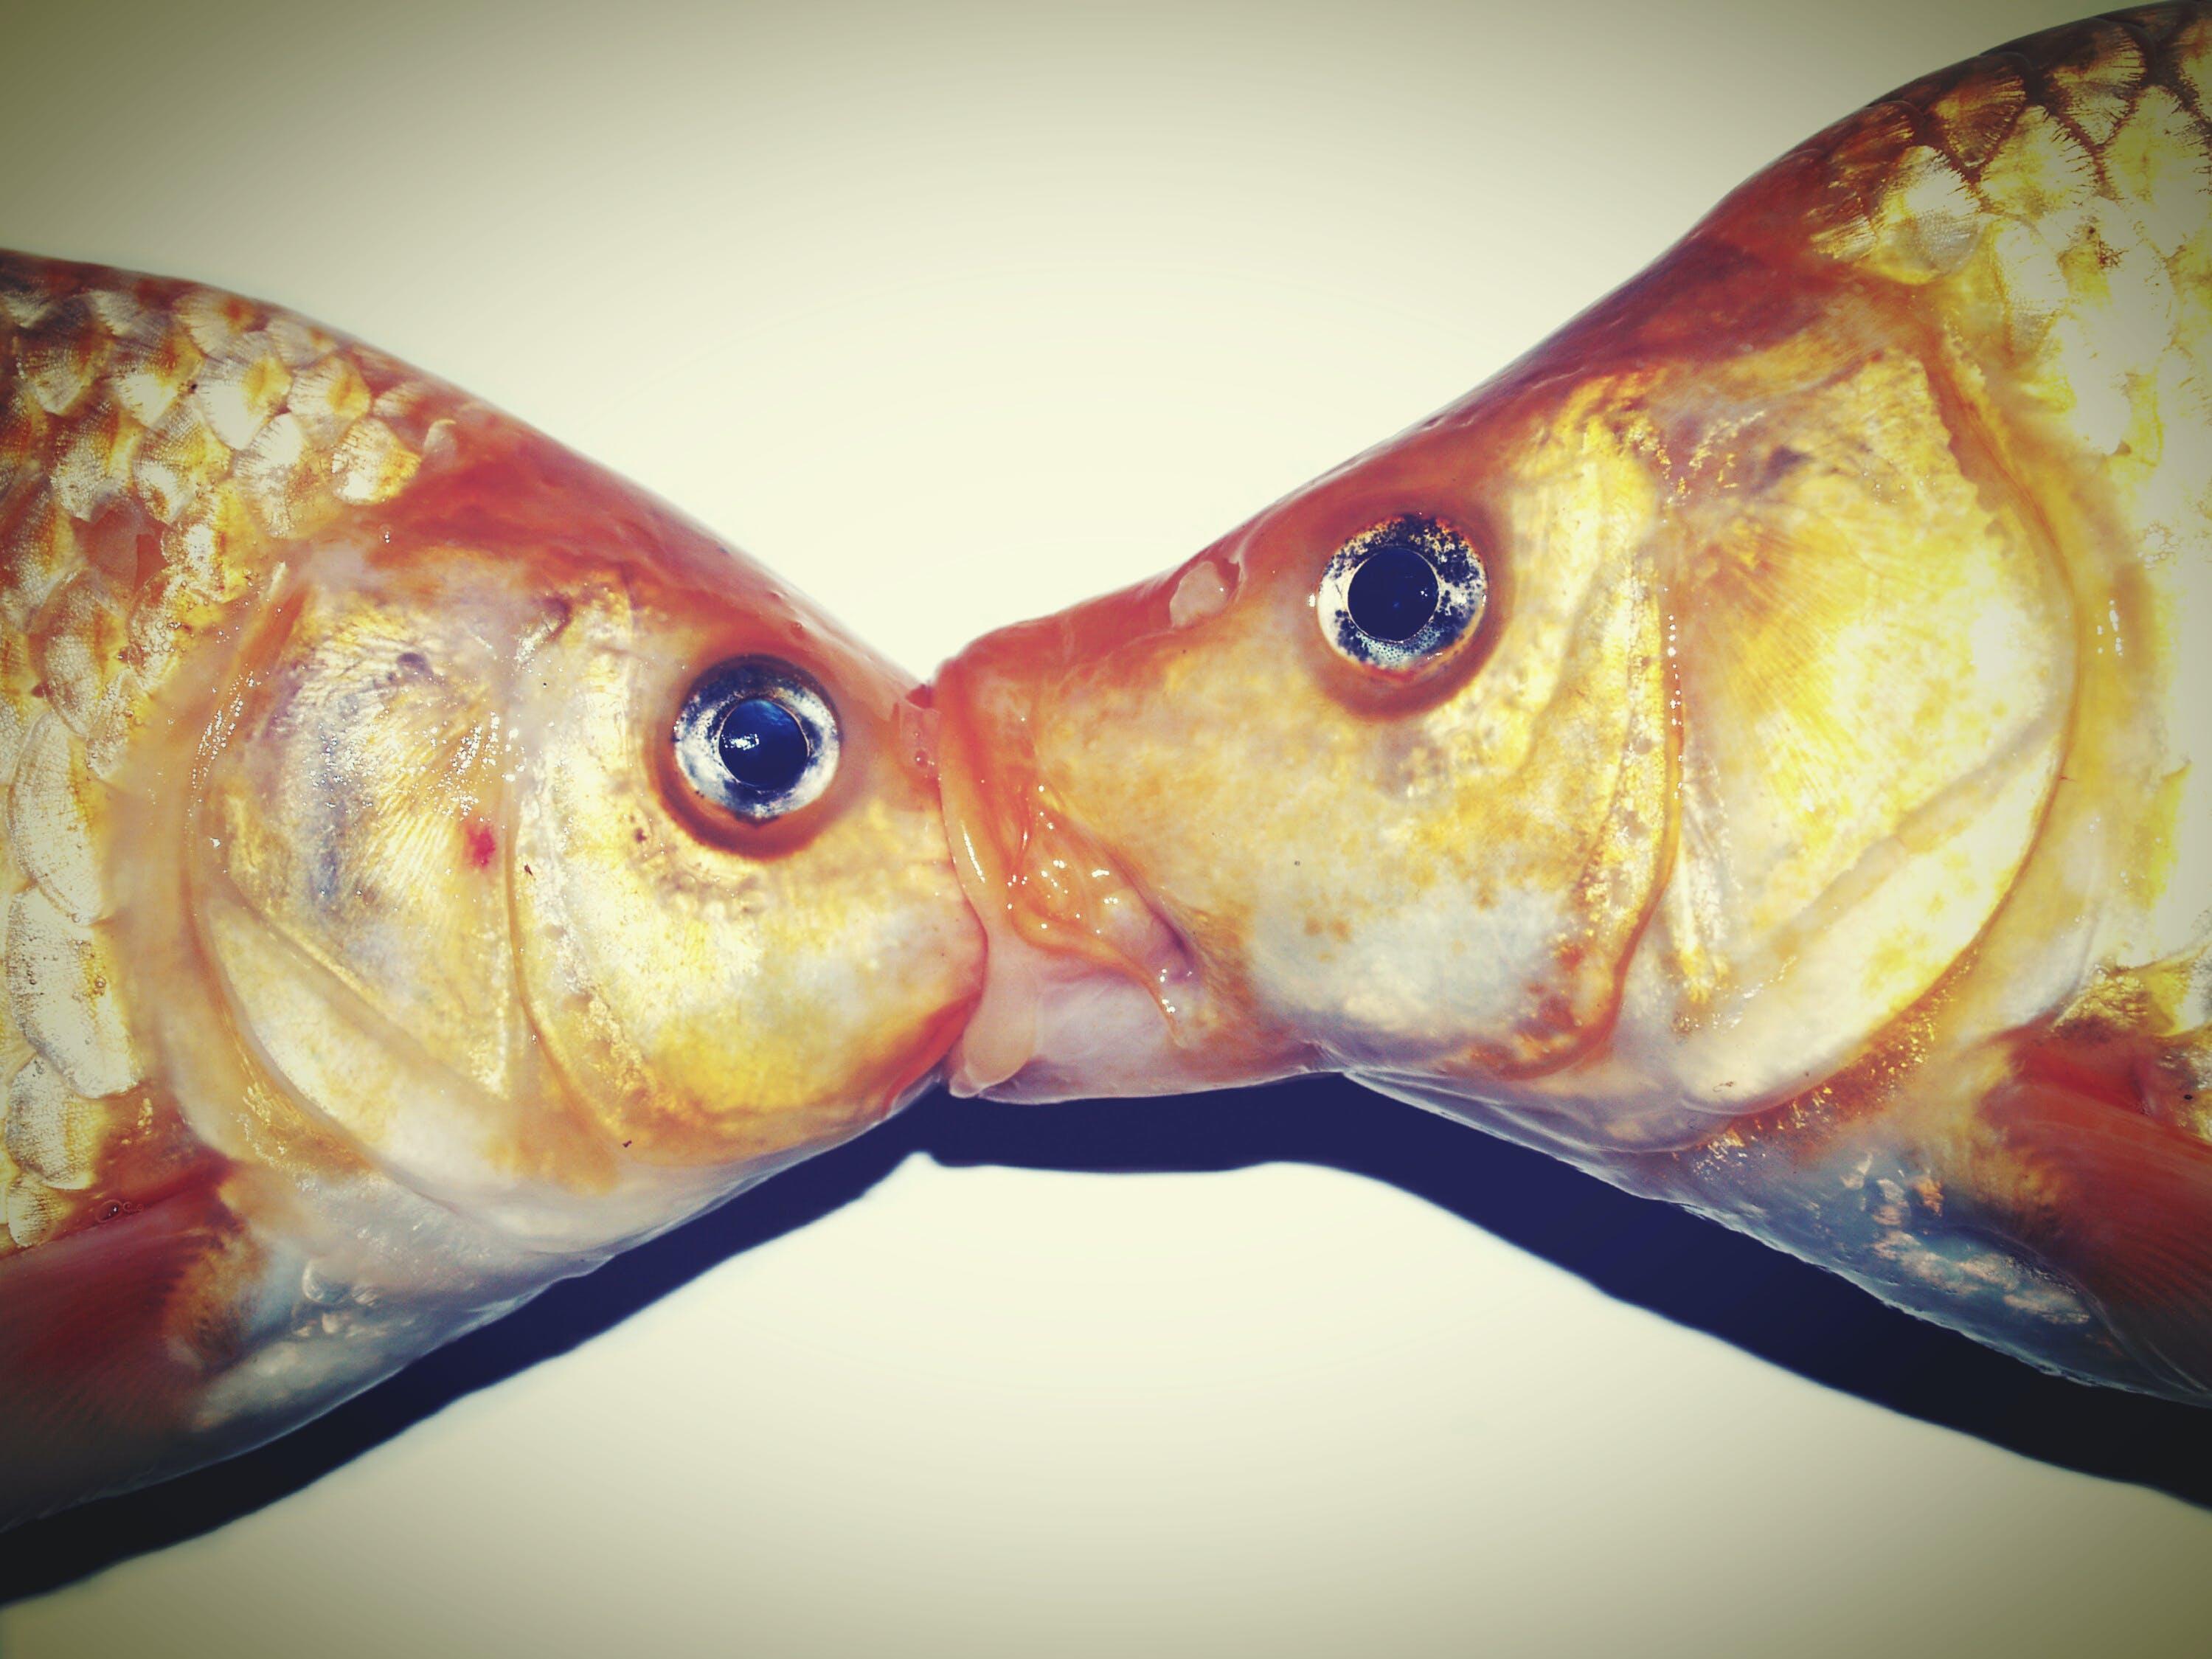 Free stock photo of animals, bream, close-up, fish